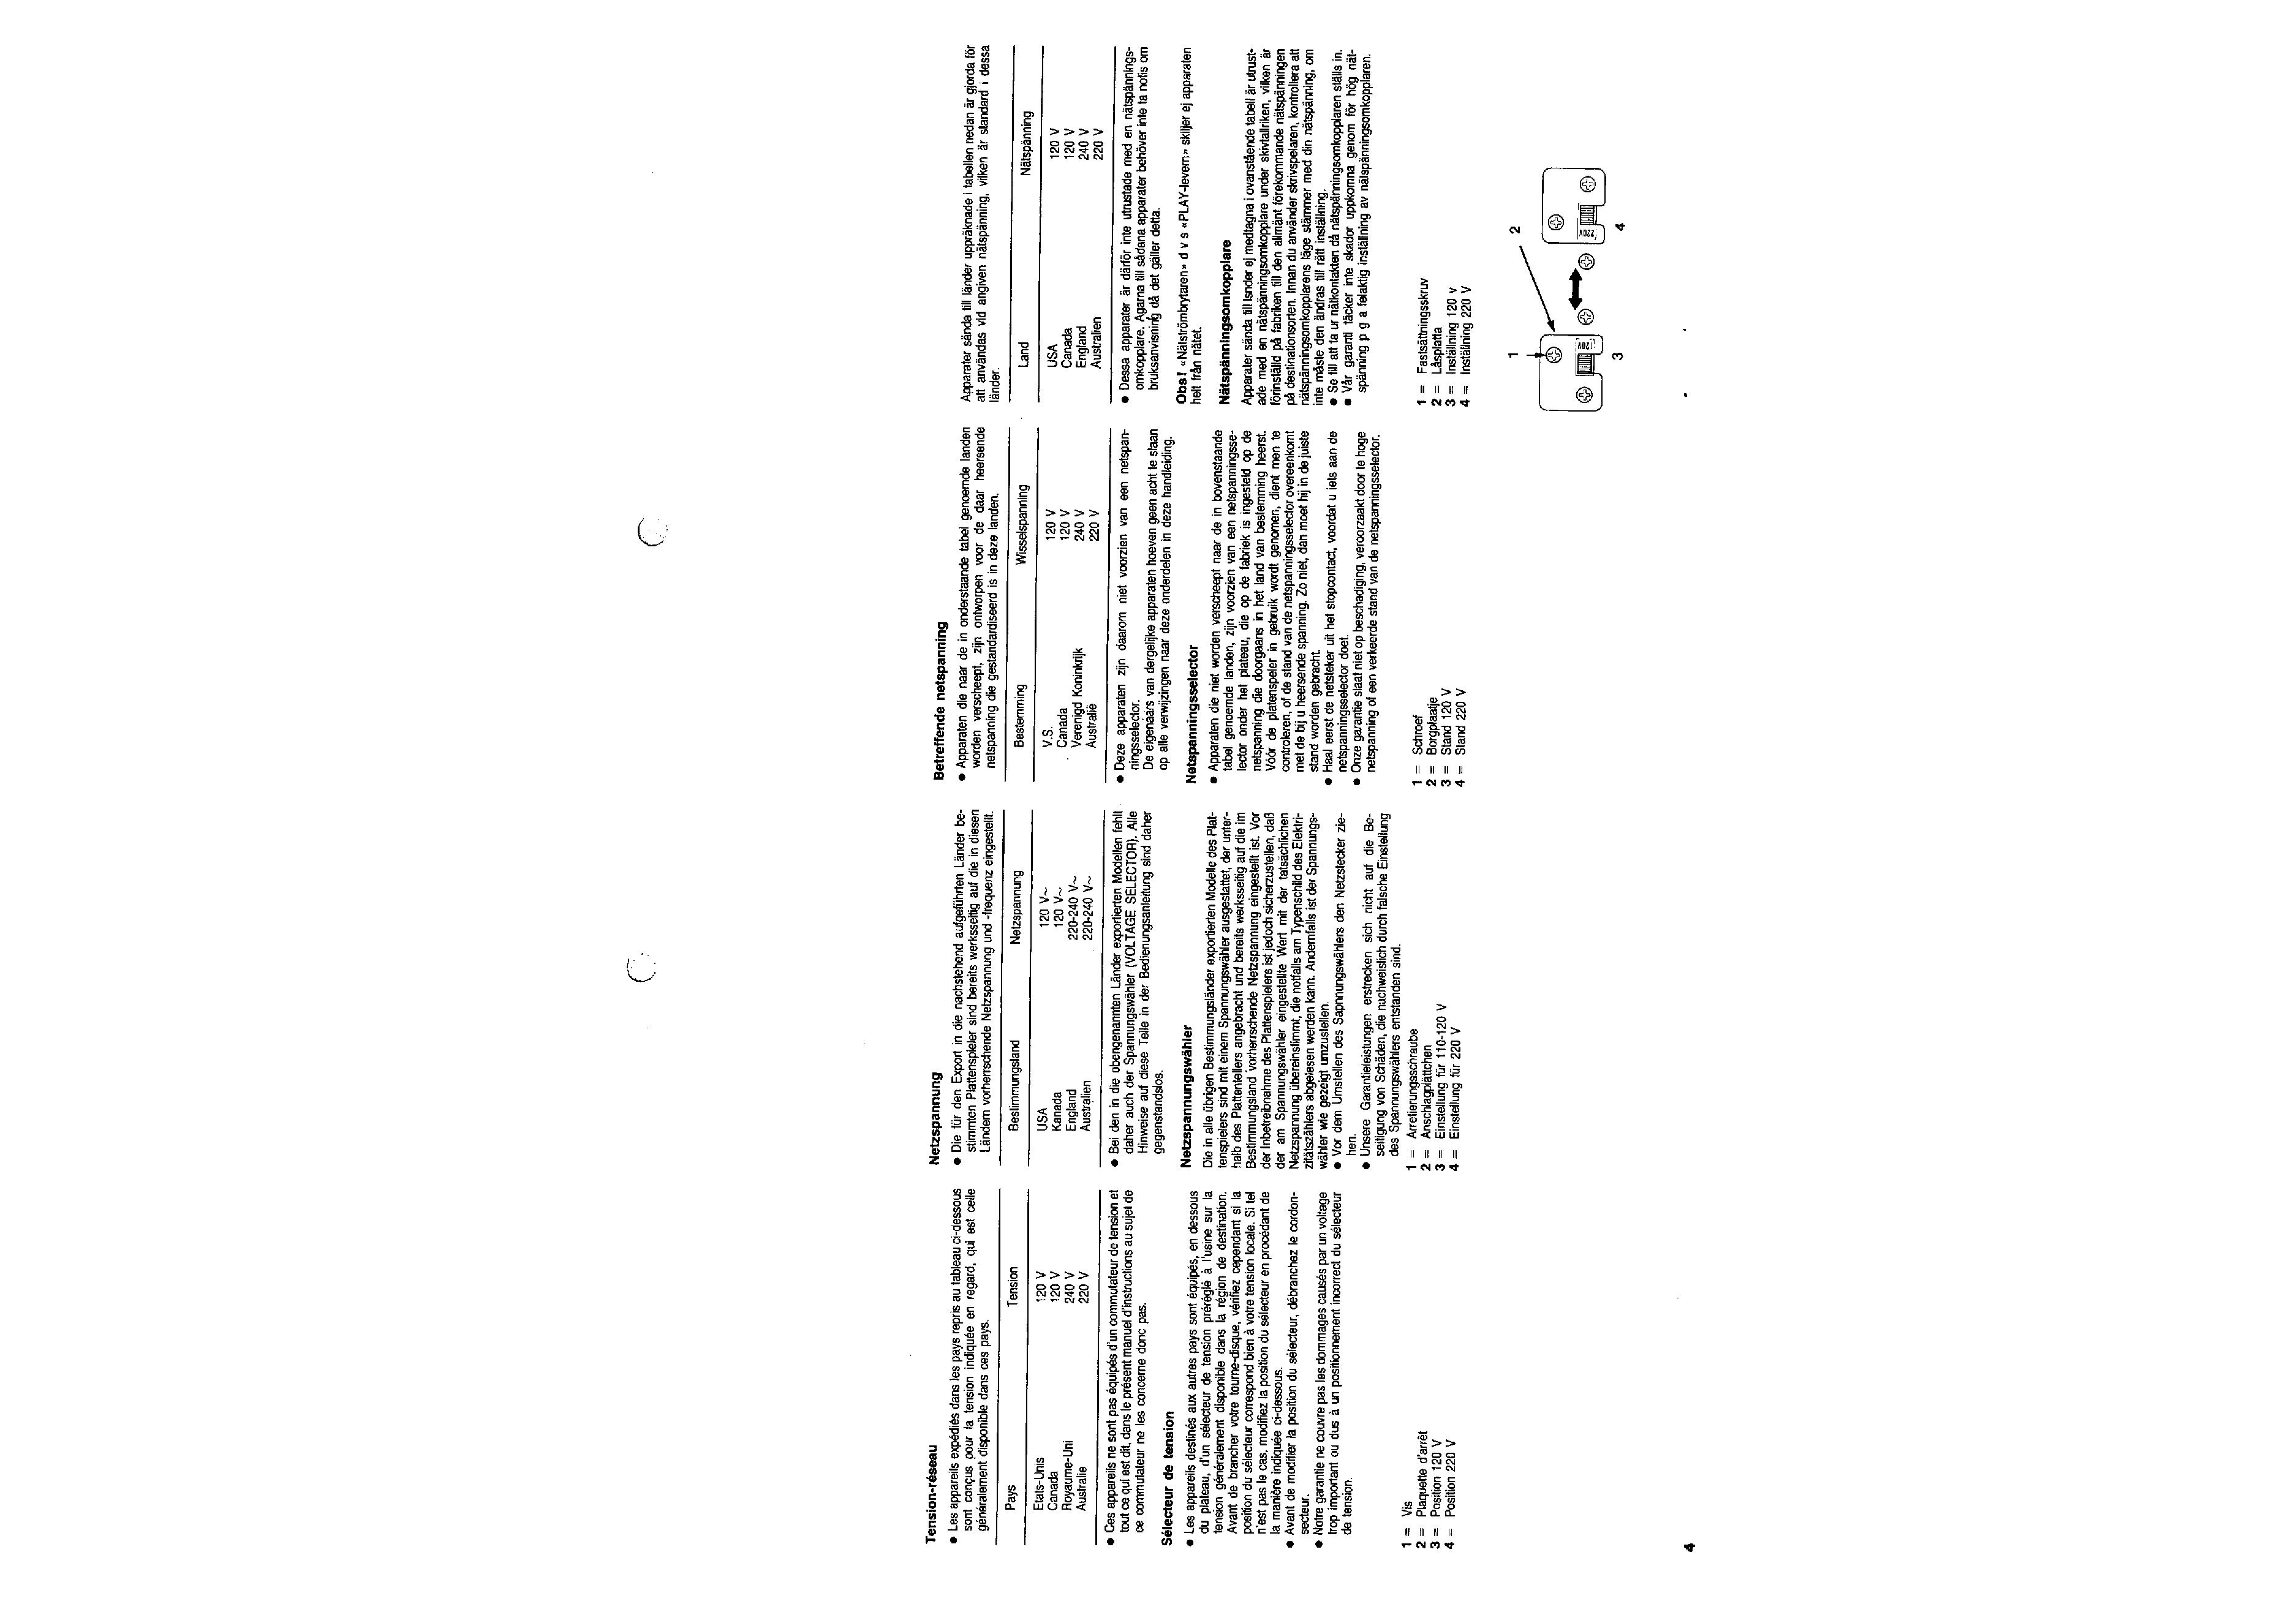 owner u0026 39 s manual for kenwood kd-3070